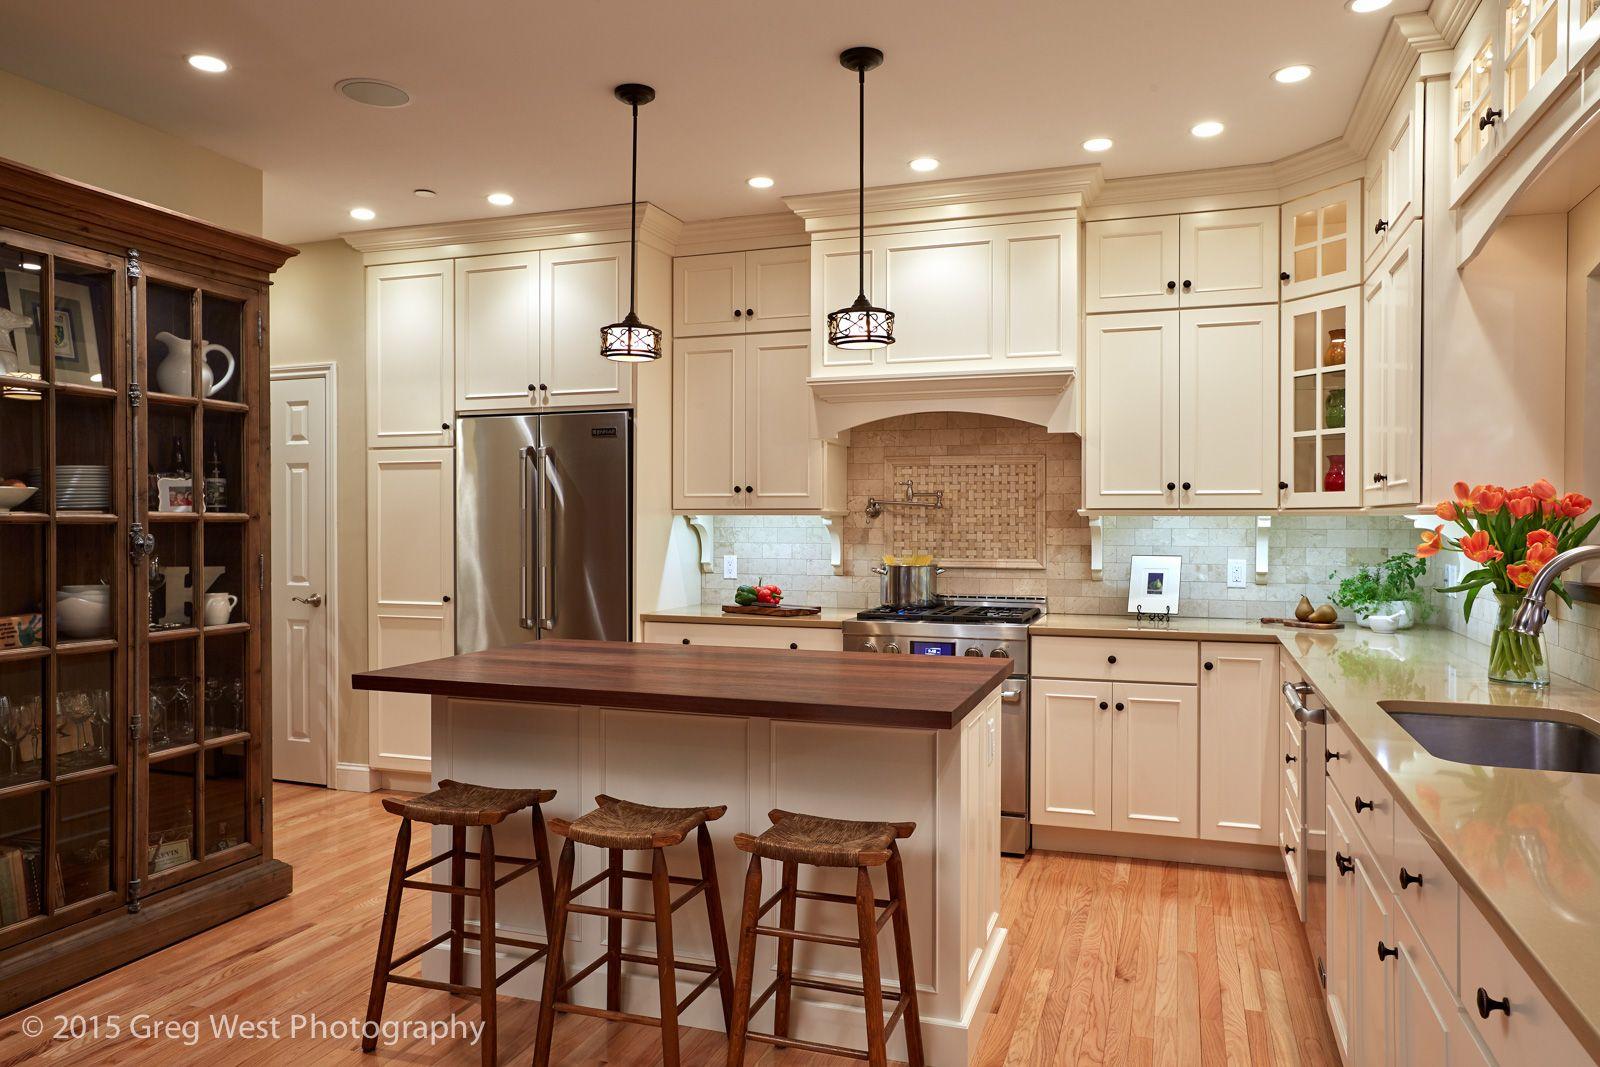 Traditional Style Kitchen Design Kitchen Island Table Kitchen Remodel